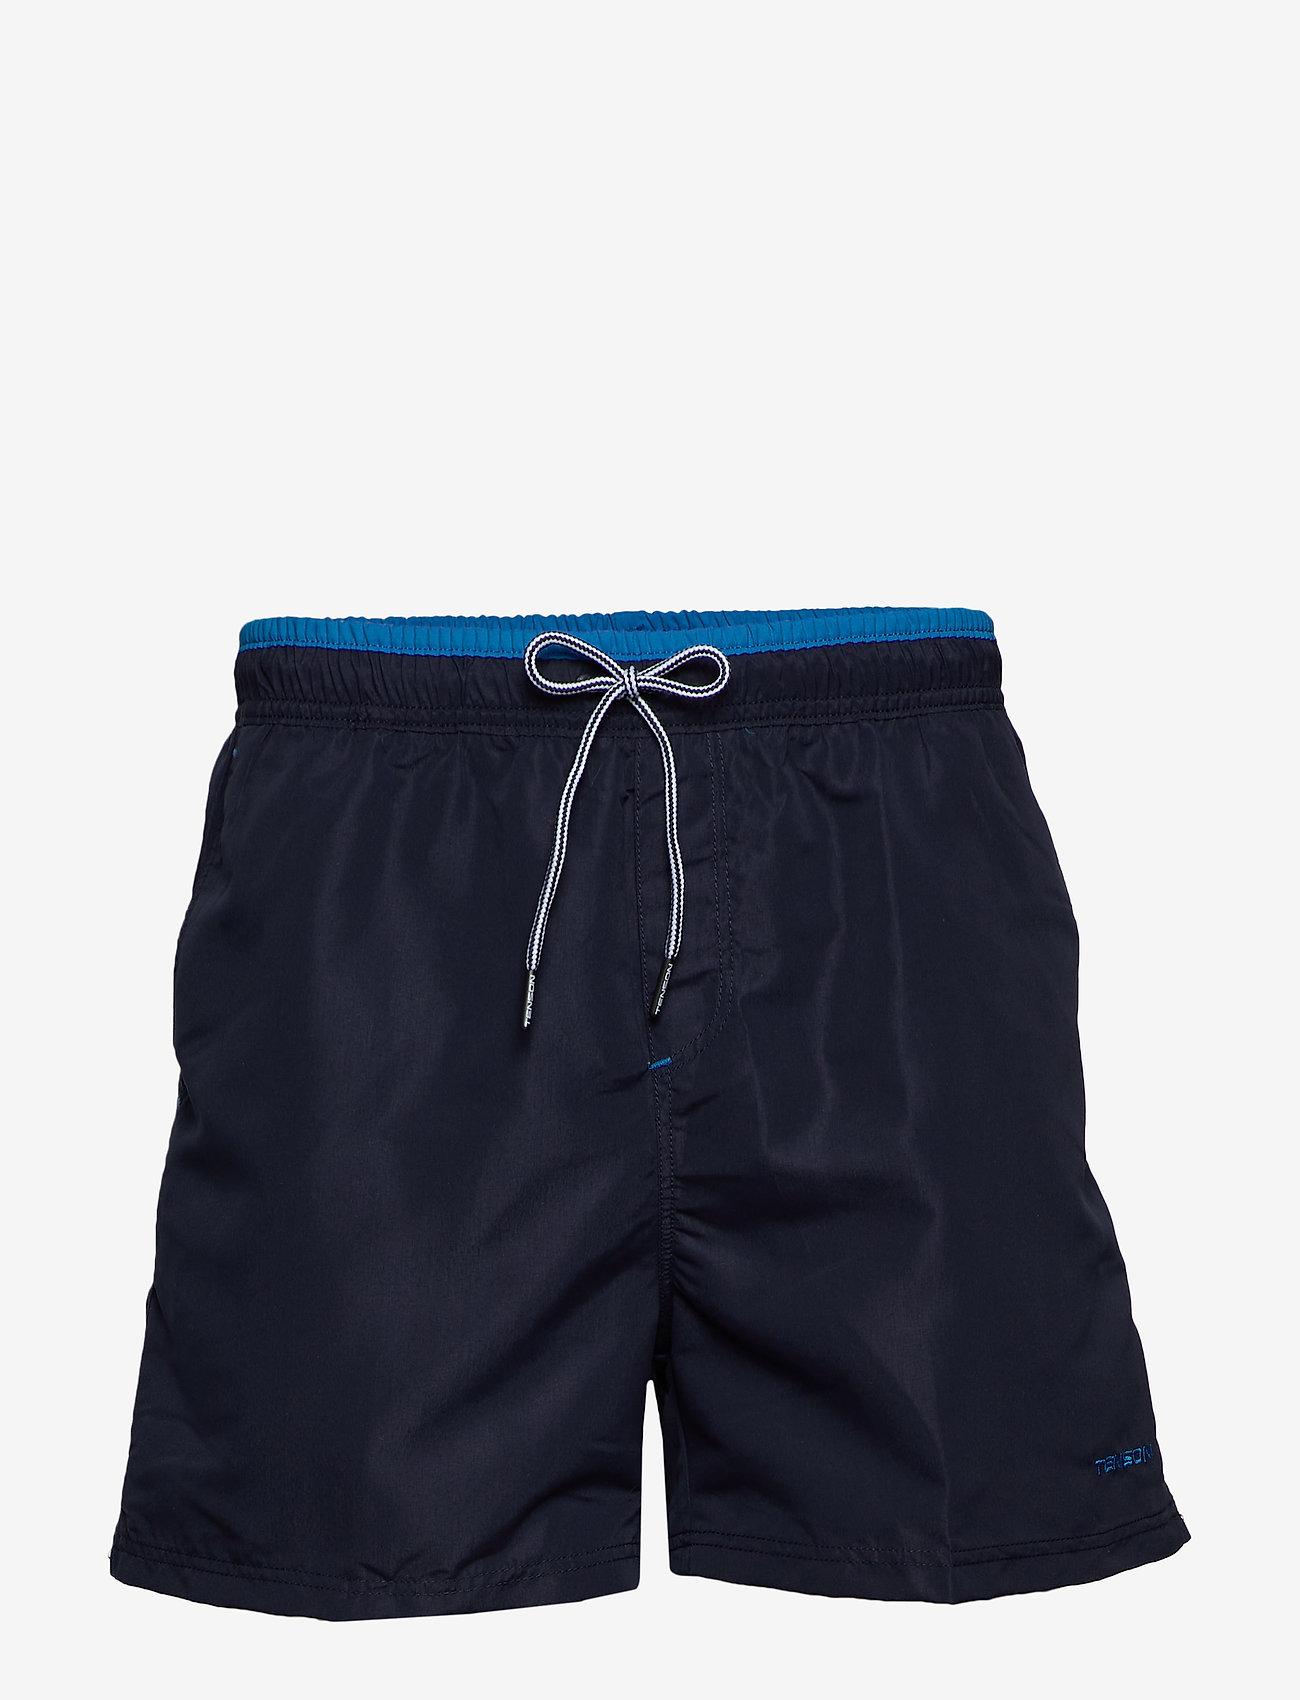 Tenson - Kos - badehosen - dark blue - 0